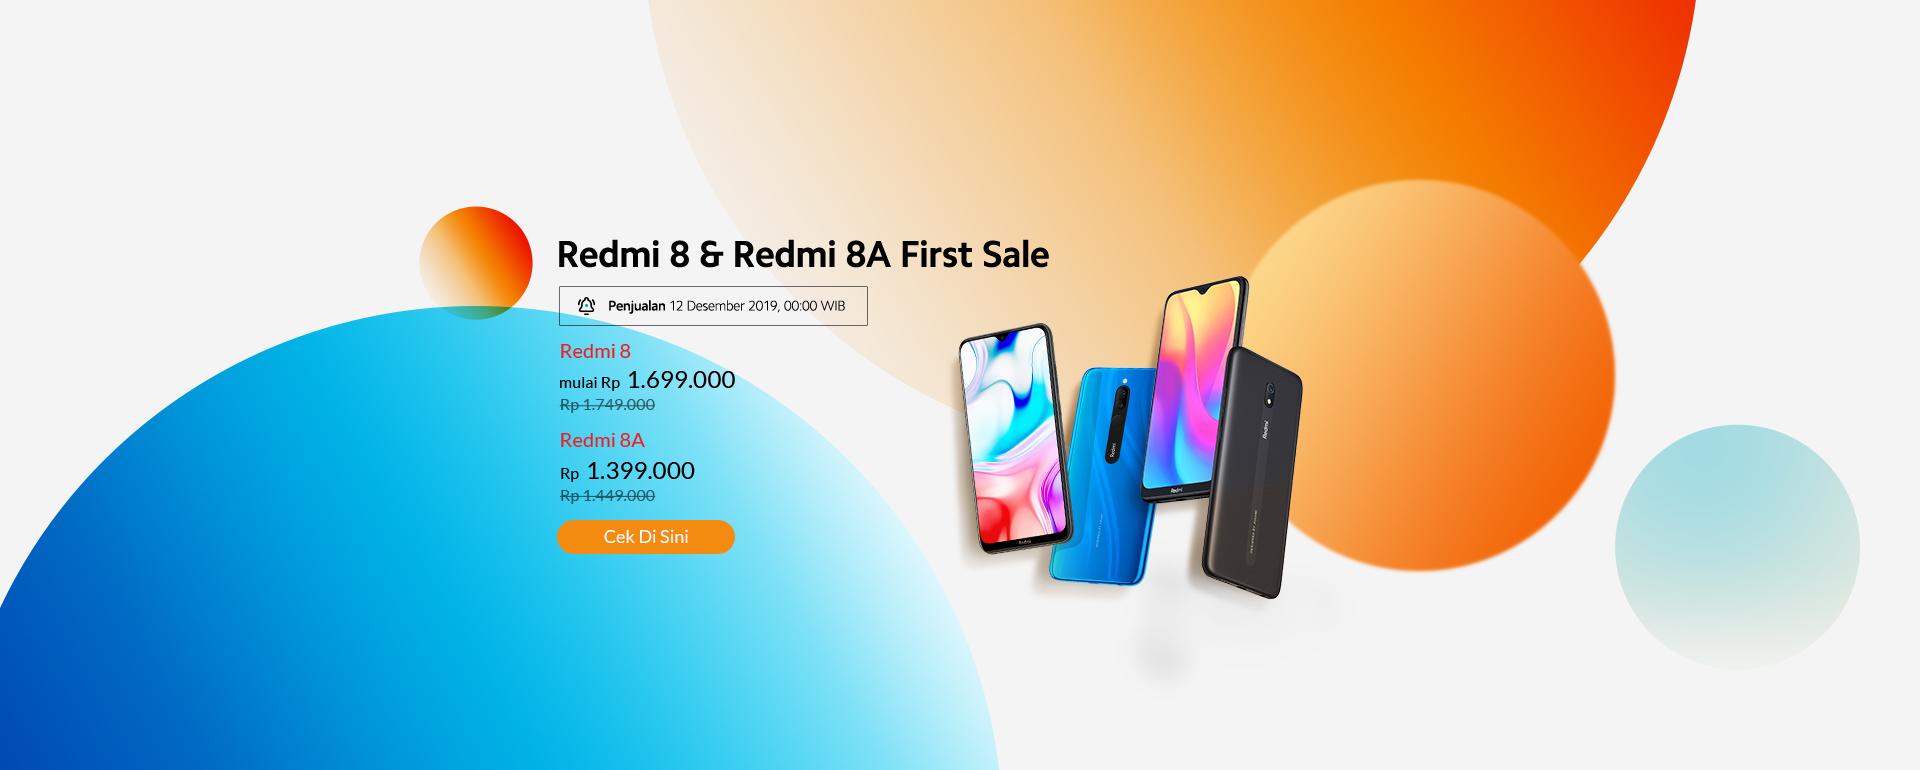 redmi  8 series